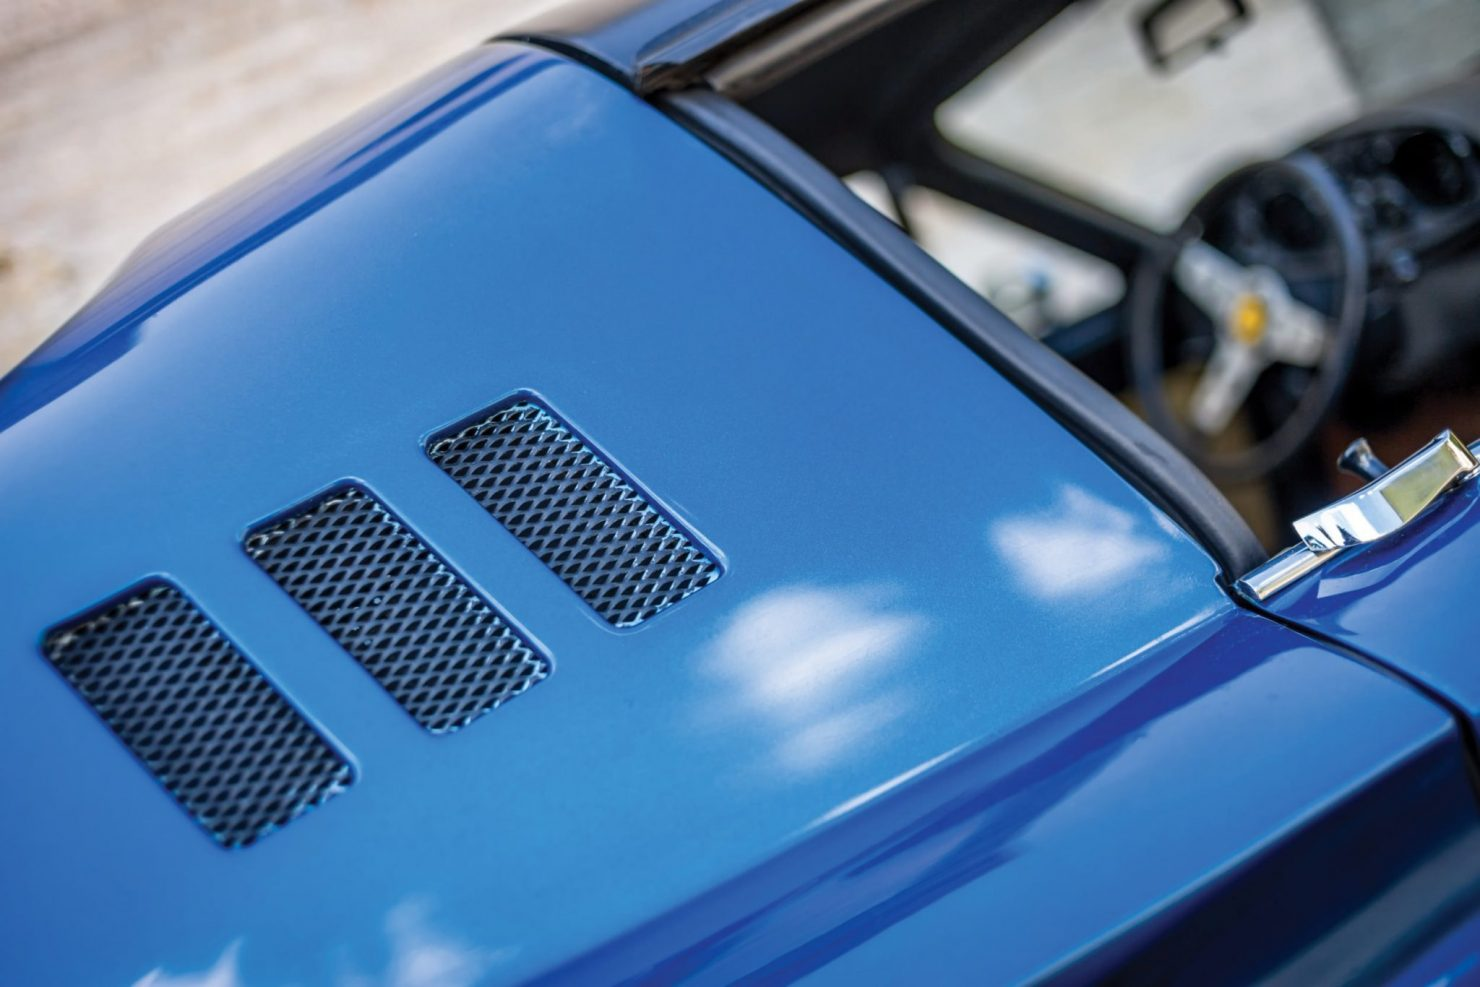 ferrari dino 246 gts car 7 1480x987 - 1973 Ferrari Dino 246 GTS